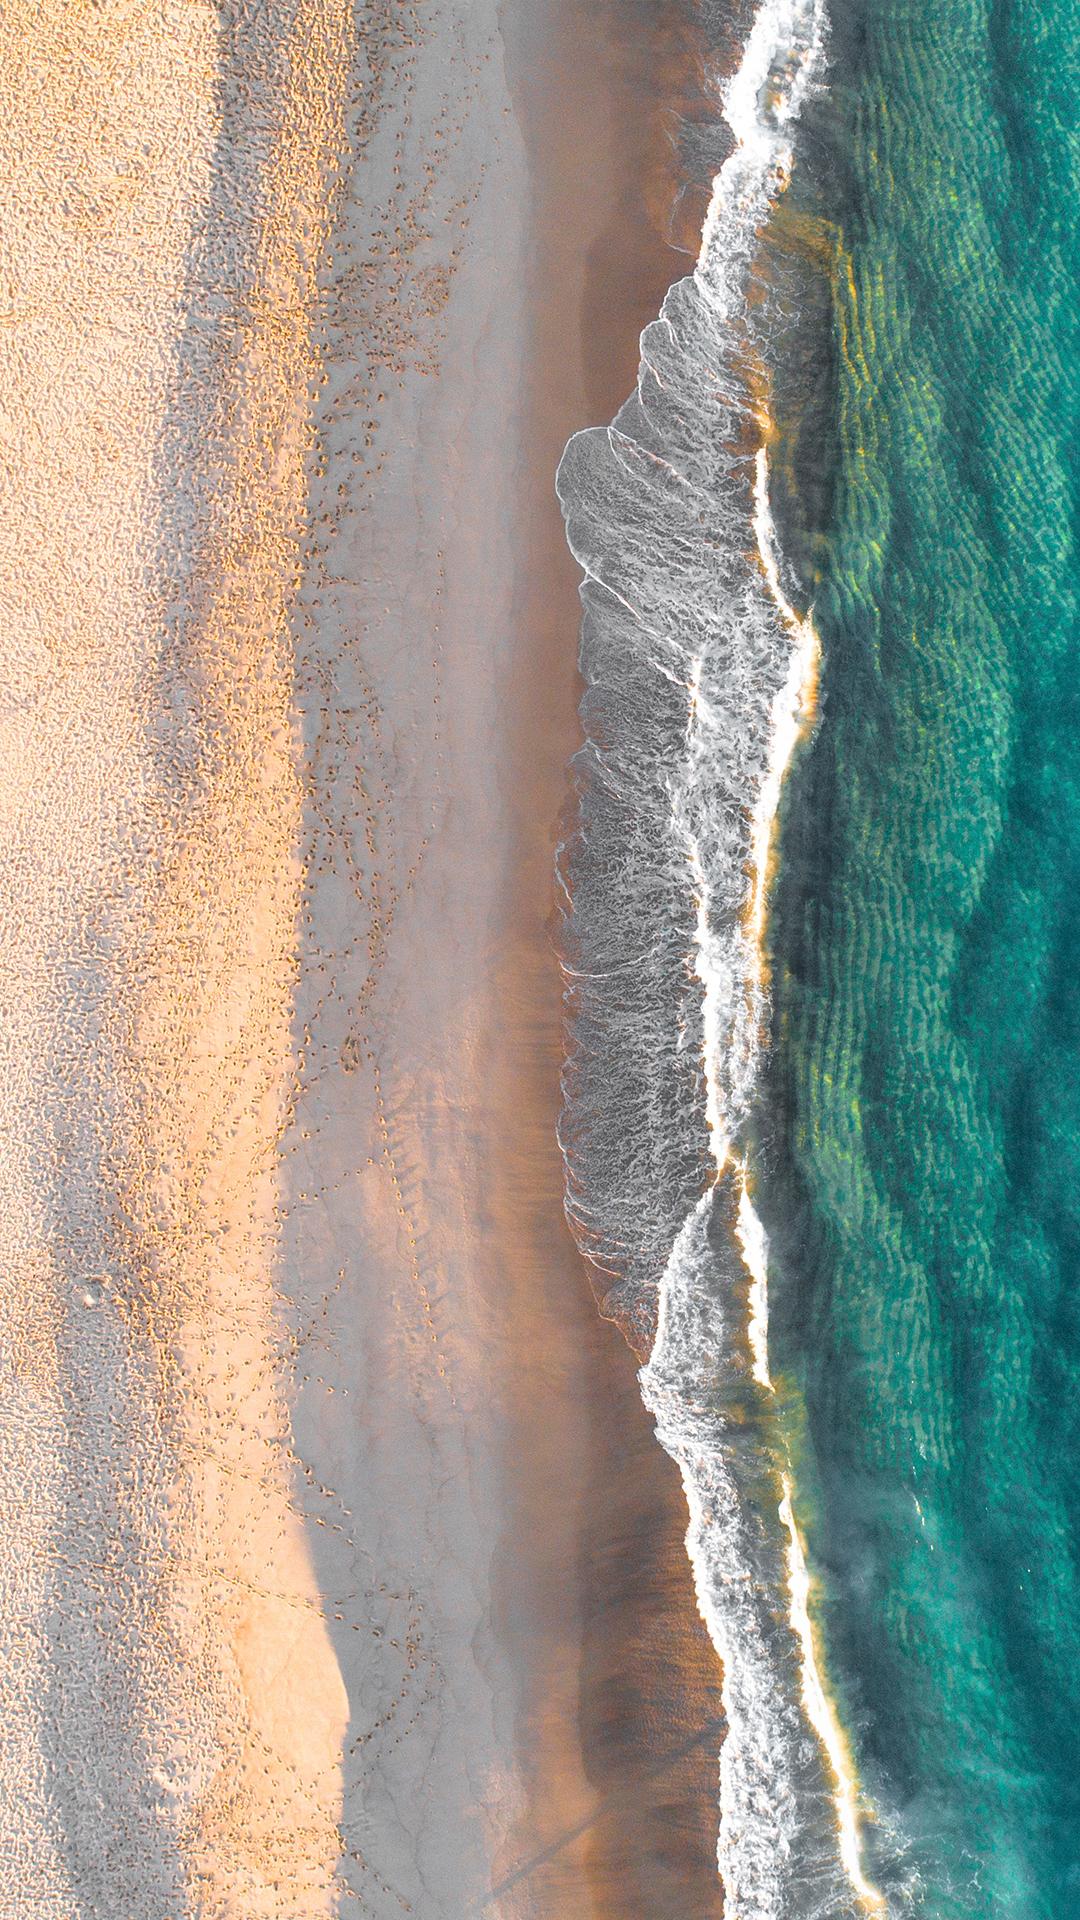 aeria shot of empty beach